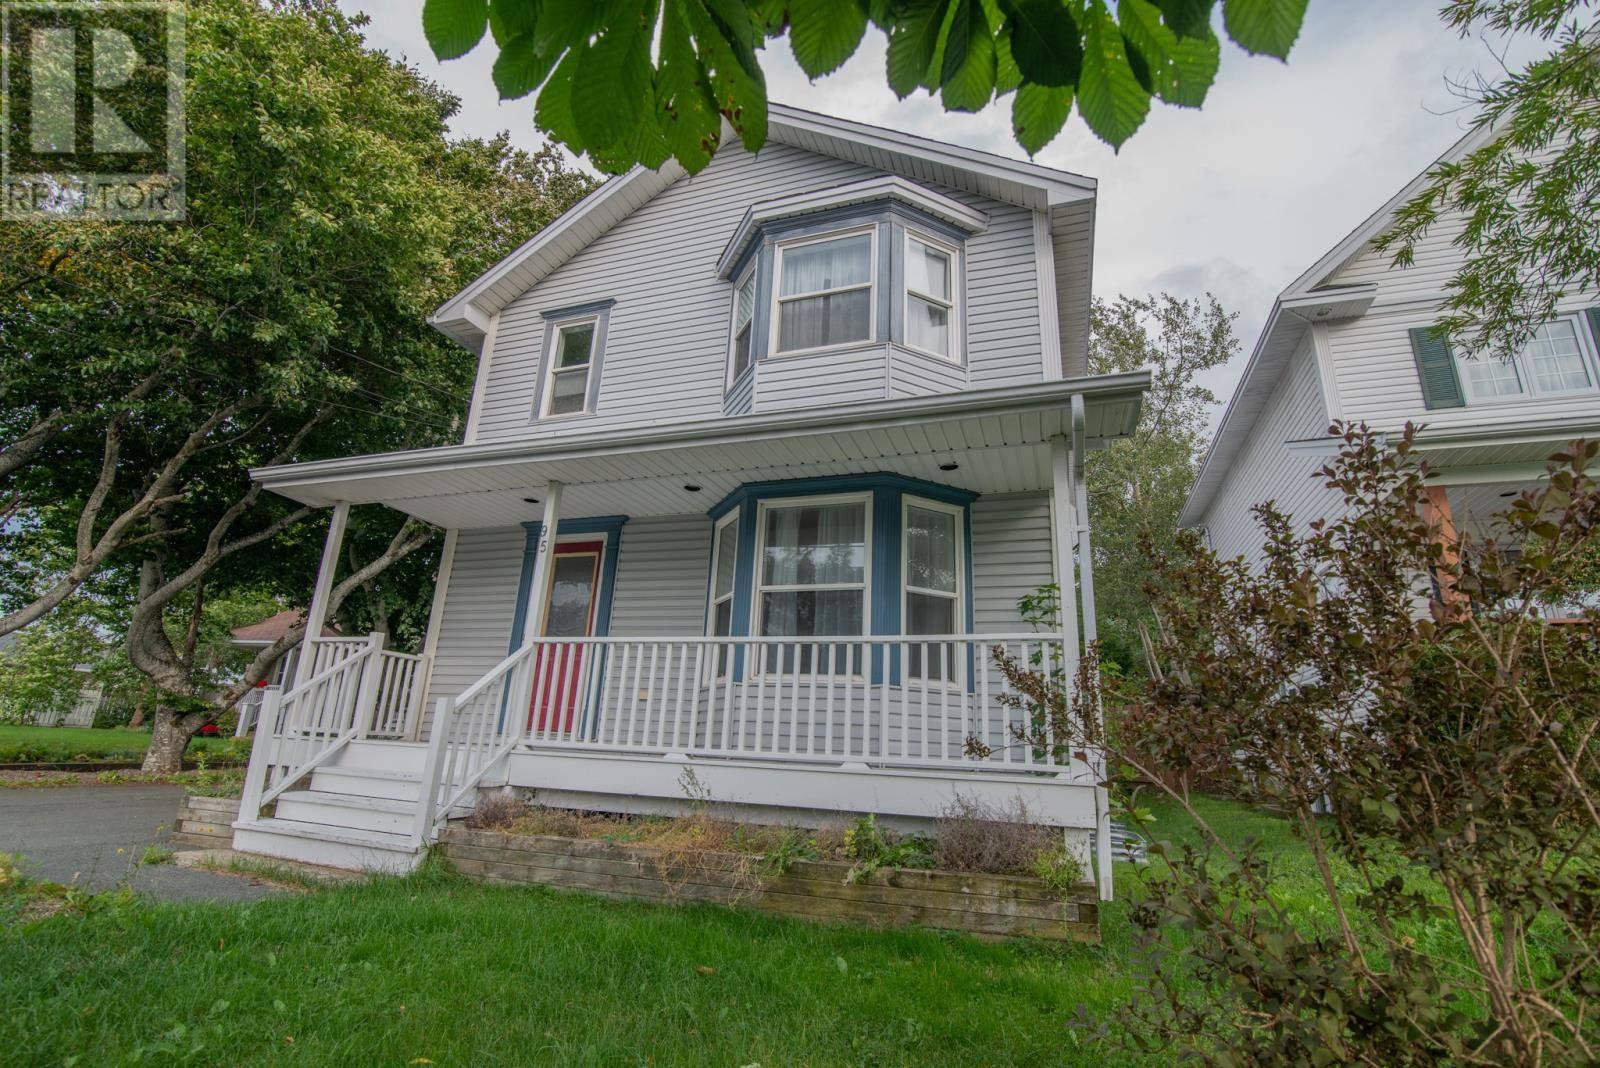 House for sale at 95 Bay Bulls Rd St. John's Newfoundland - MLS: 1200404